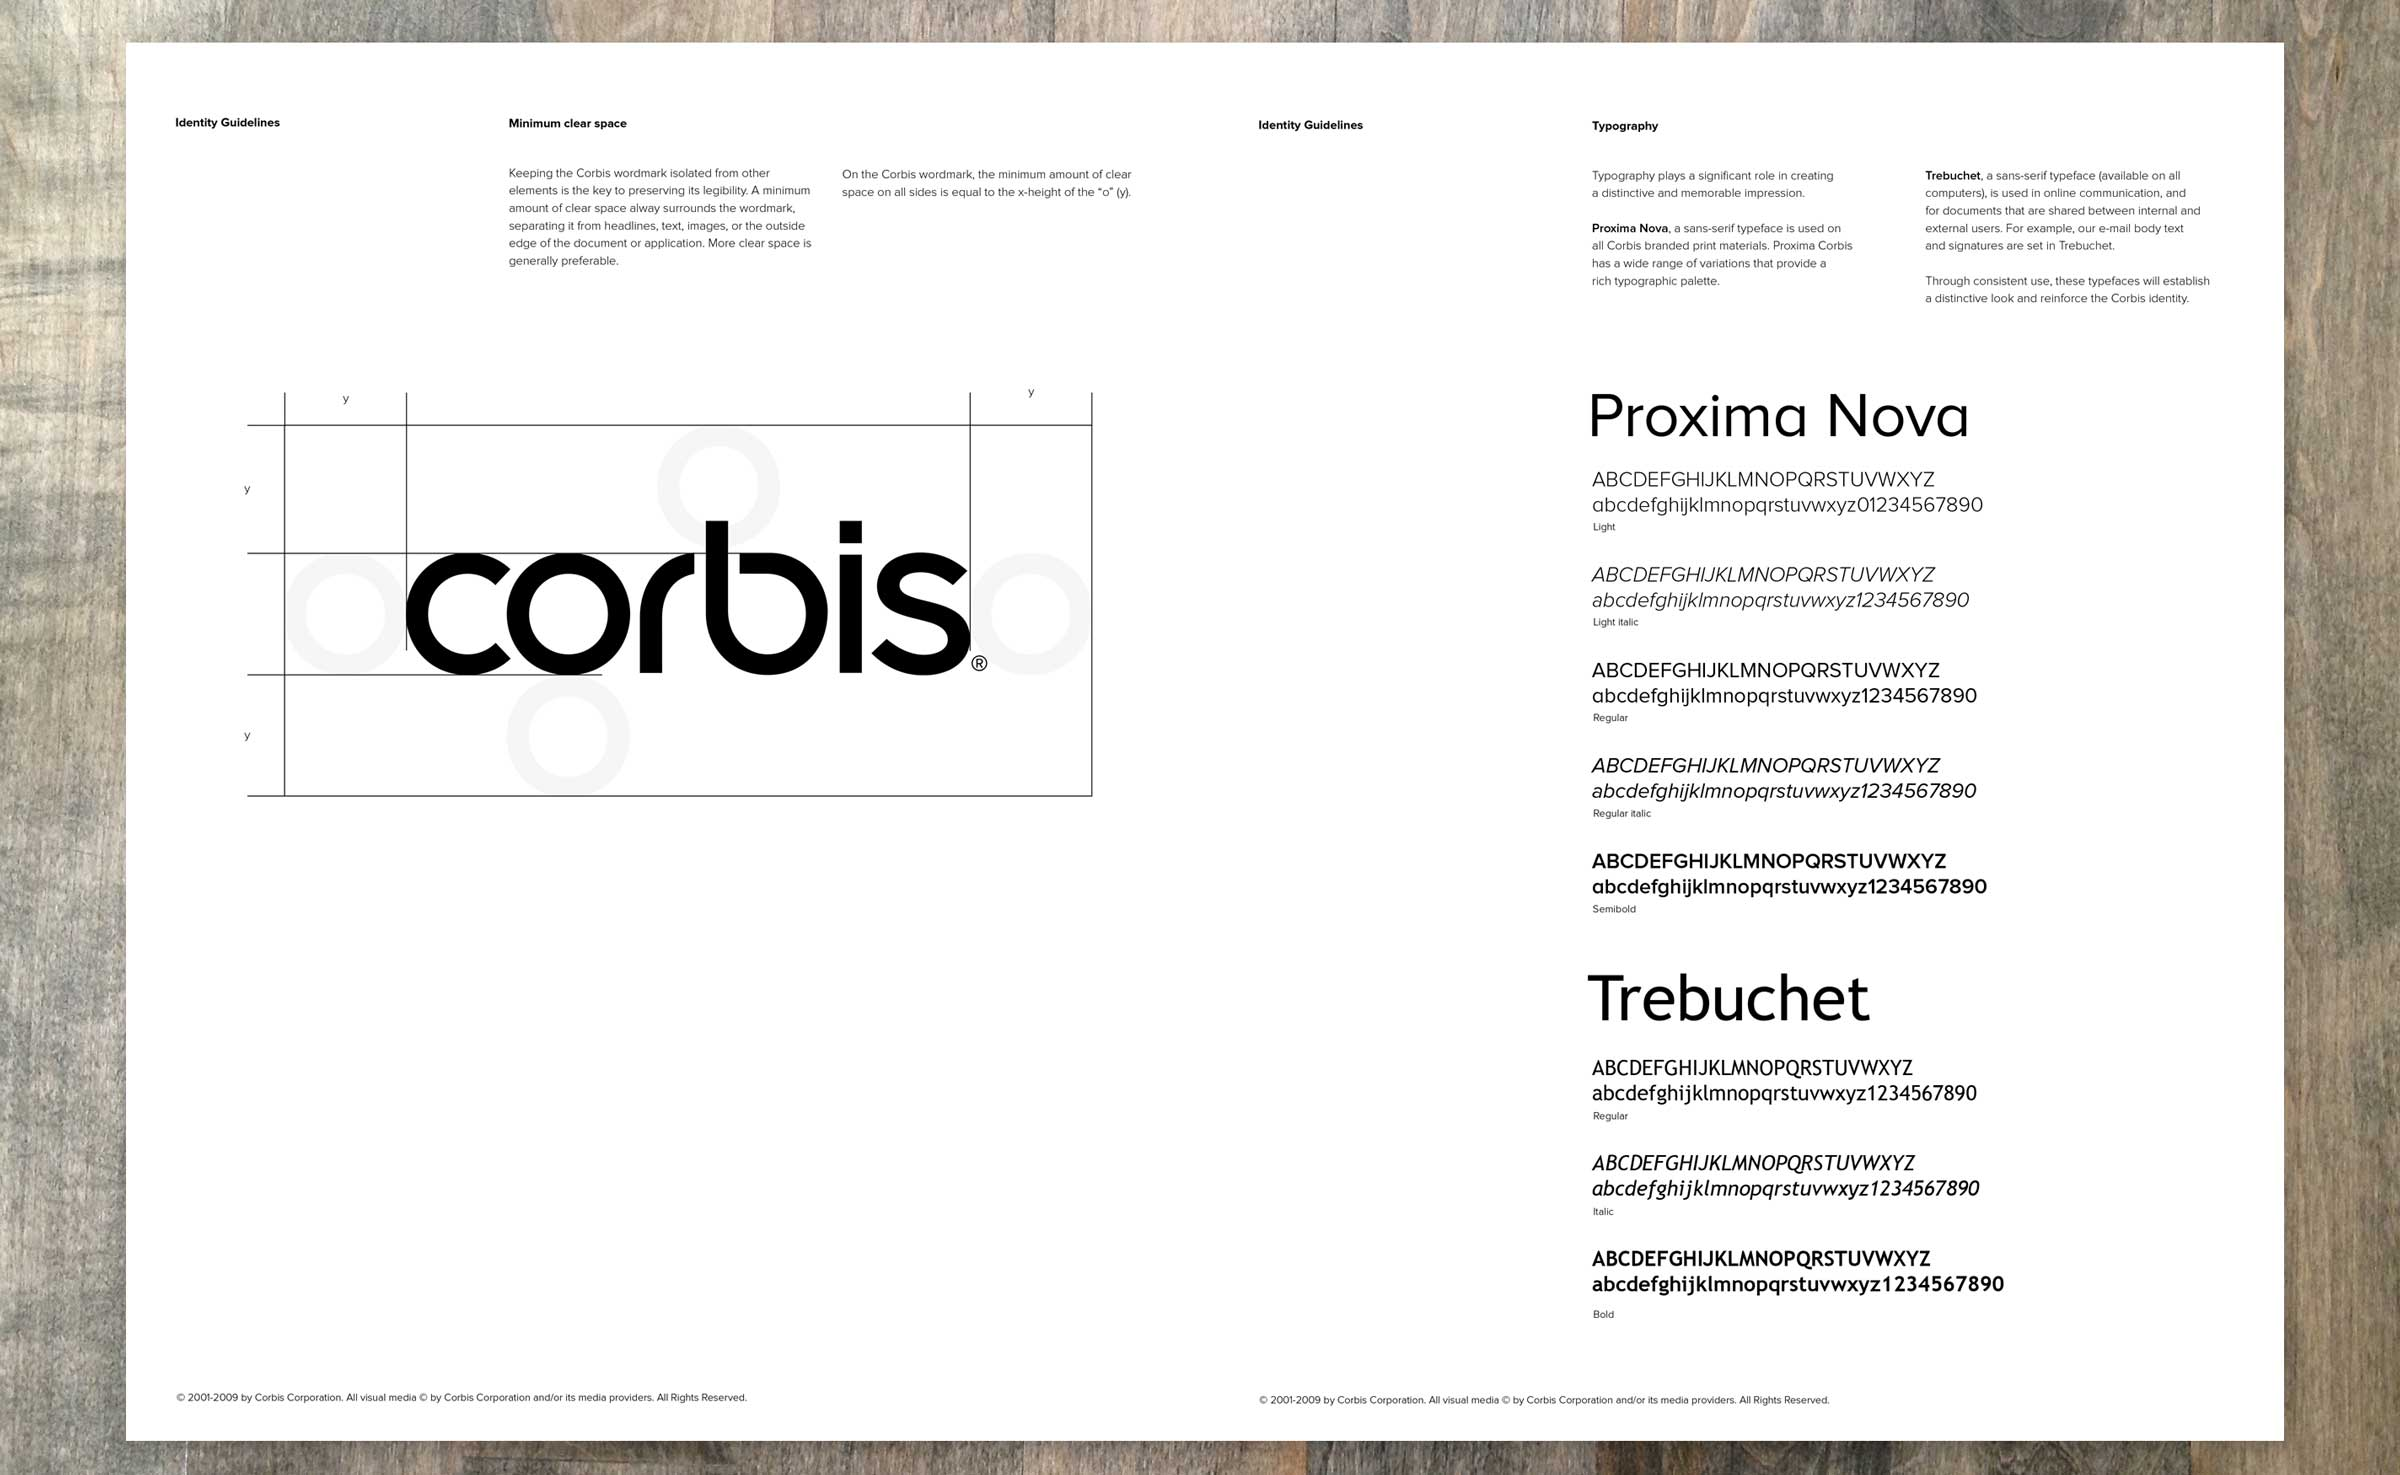 corbis_logo3.jpg